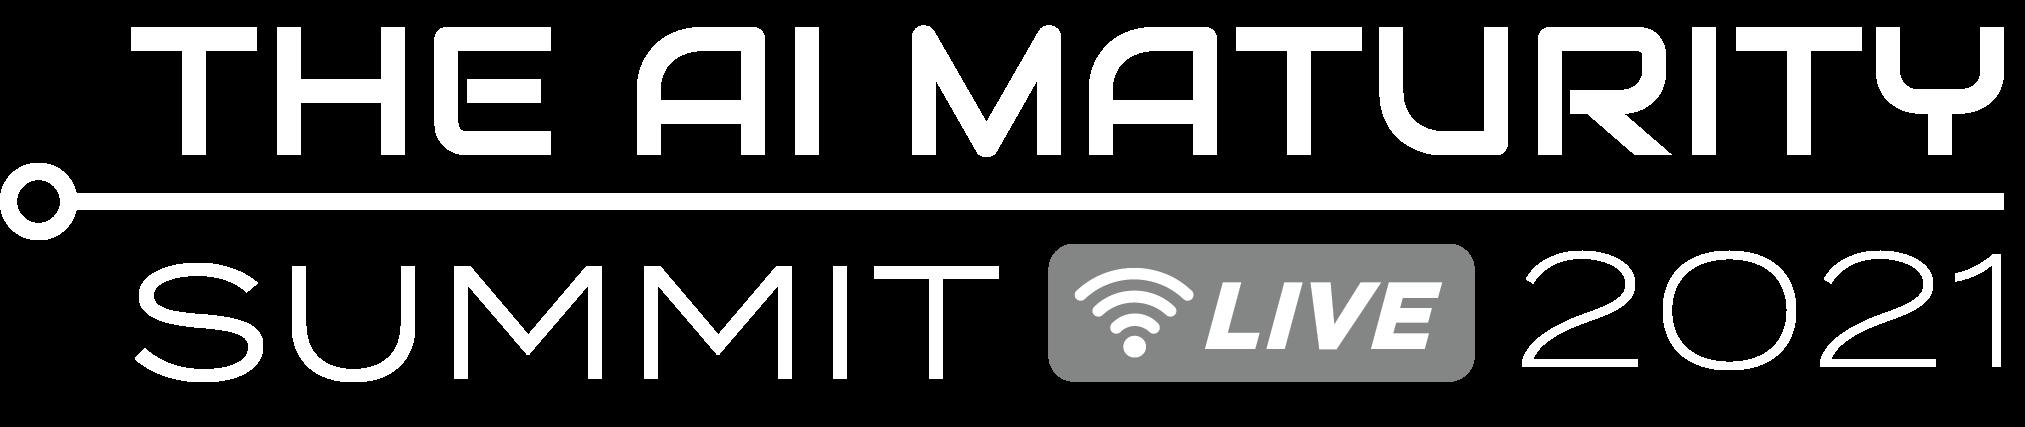 The AI Maturity Summit: LIVE 2021